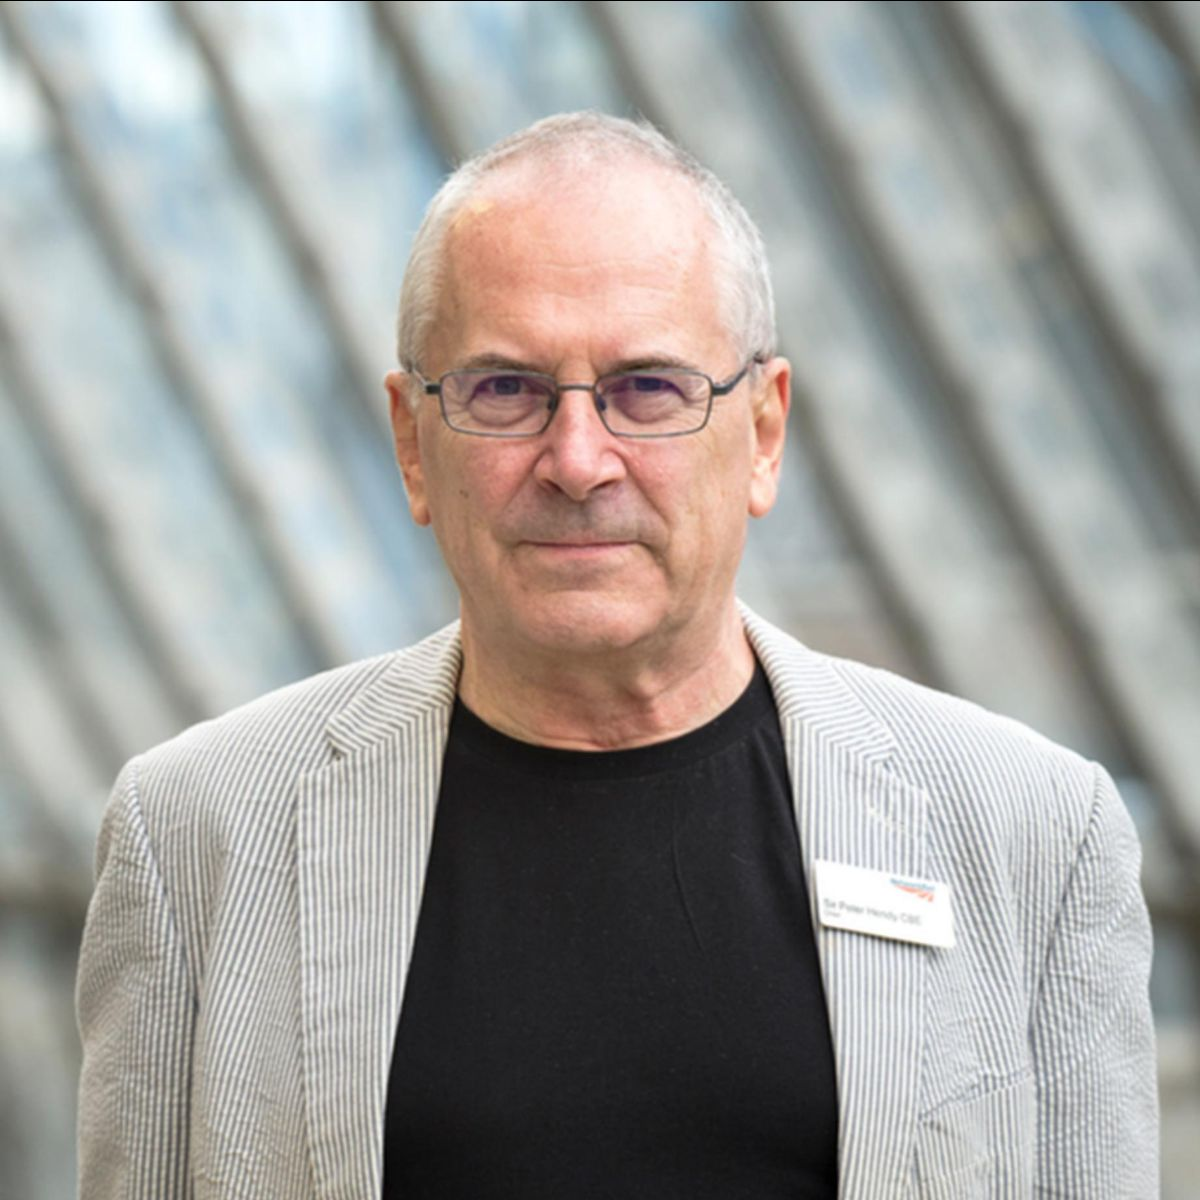 Sir Peter Hendy CBE